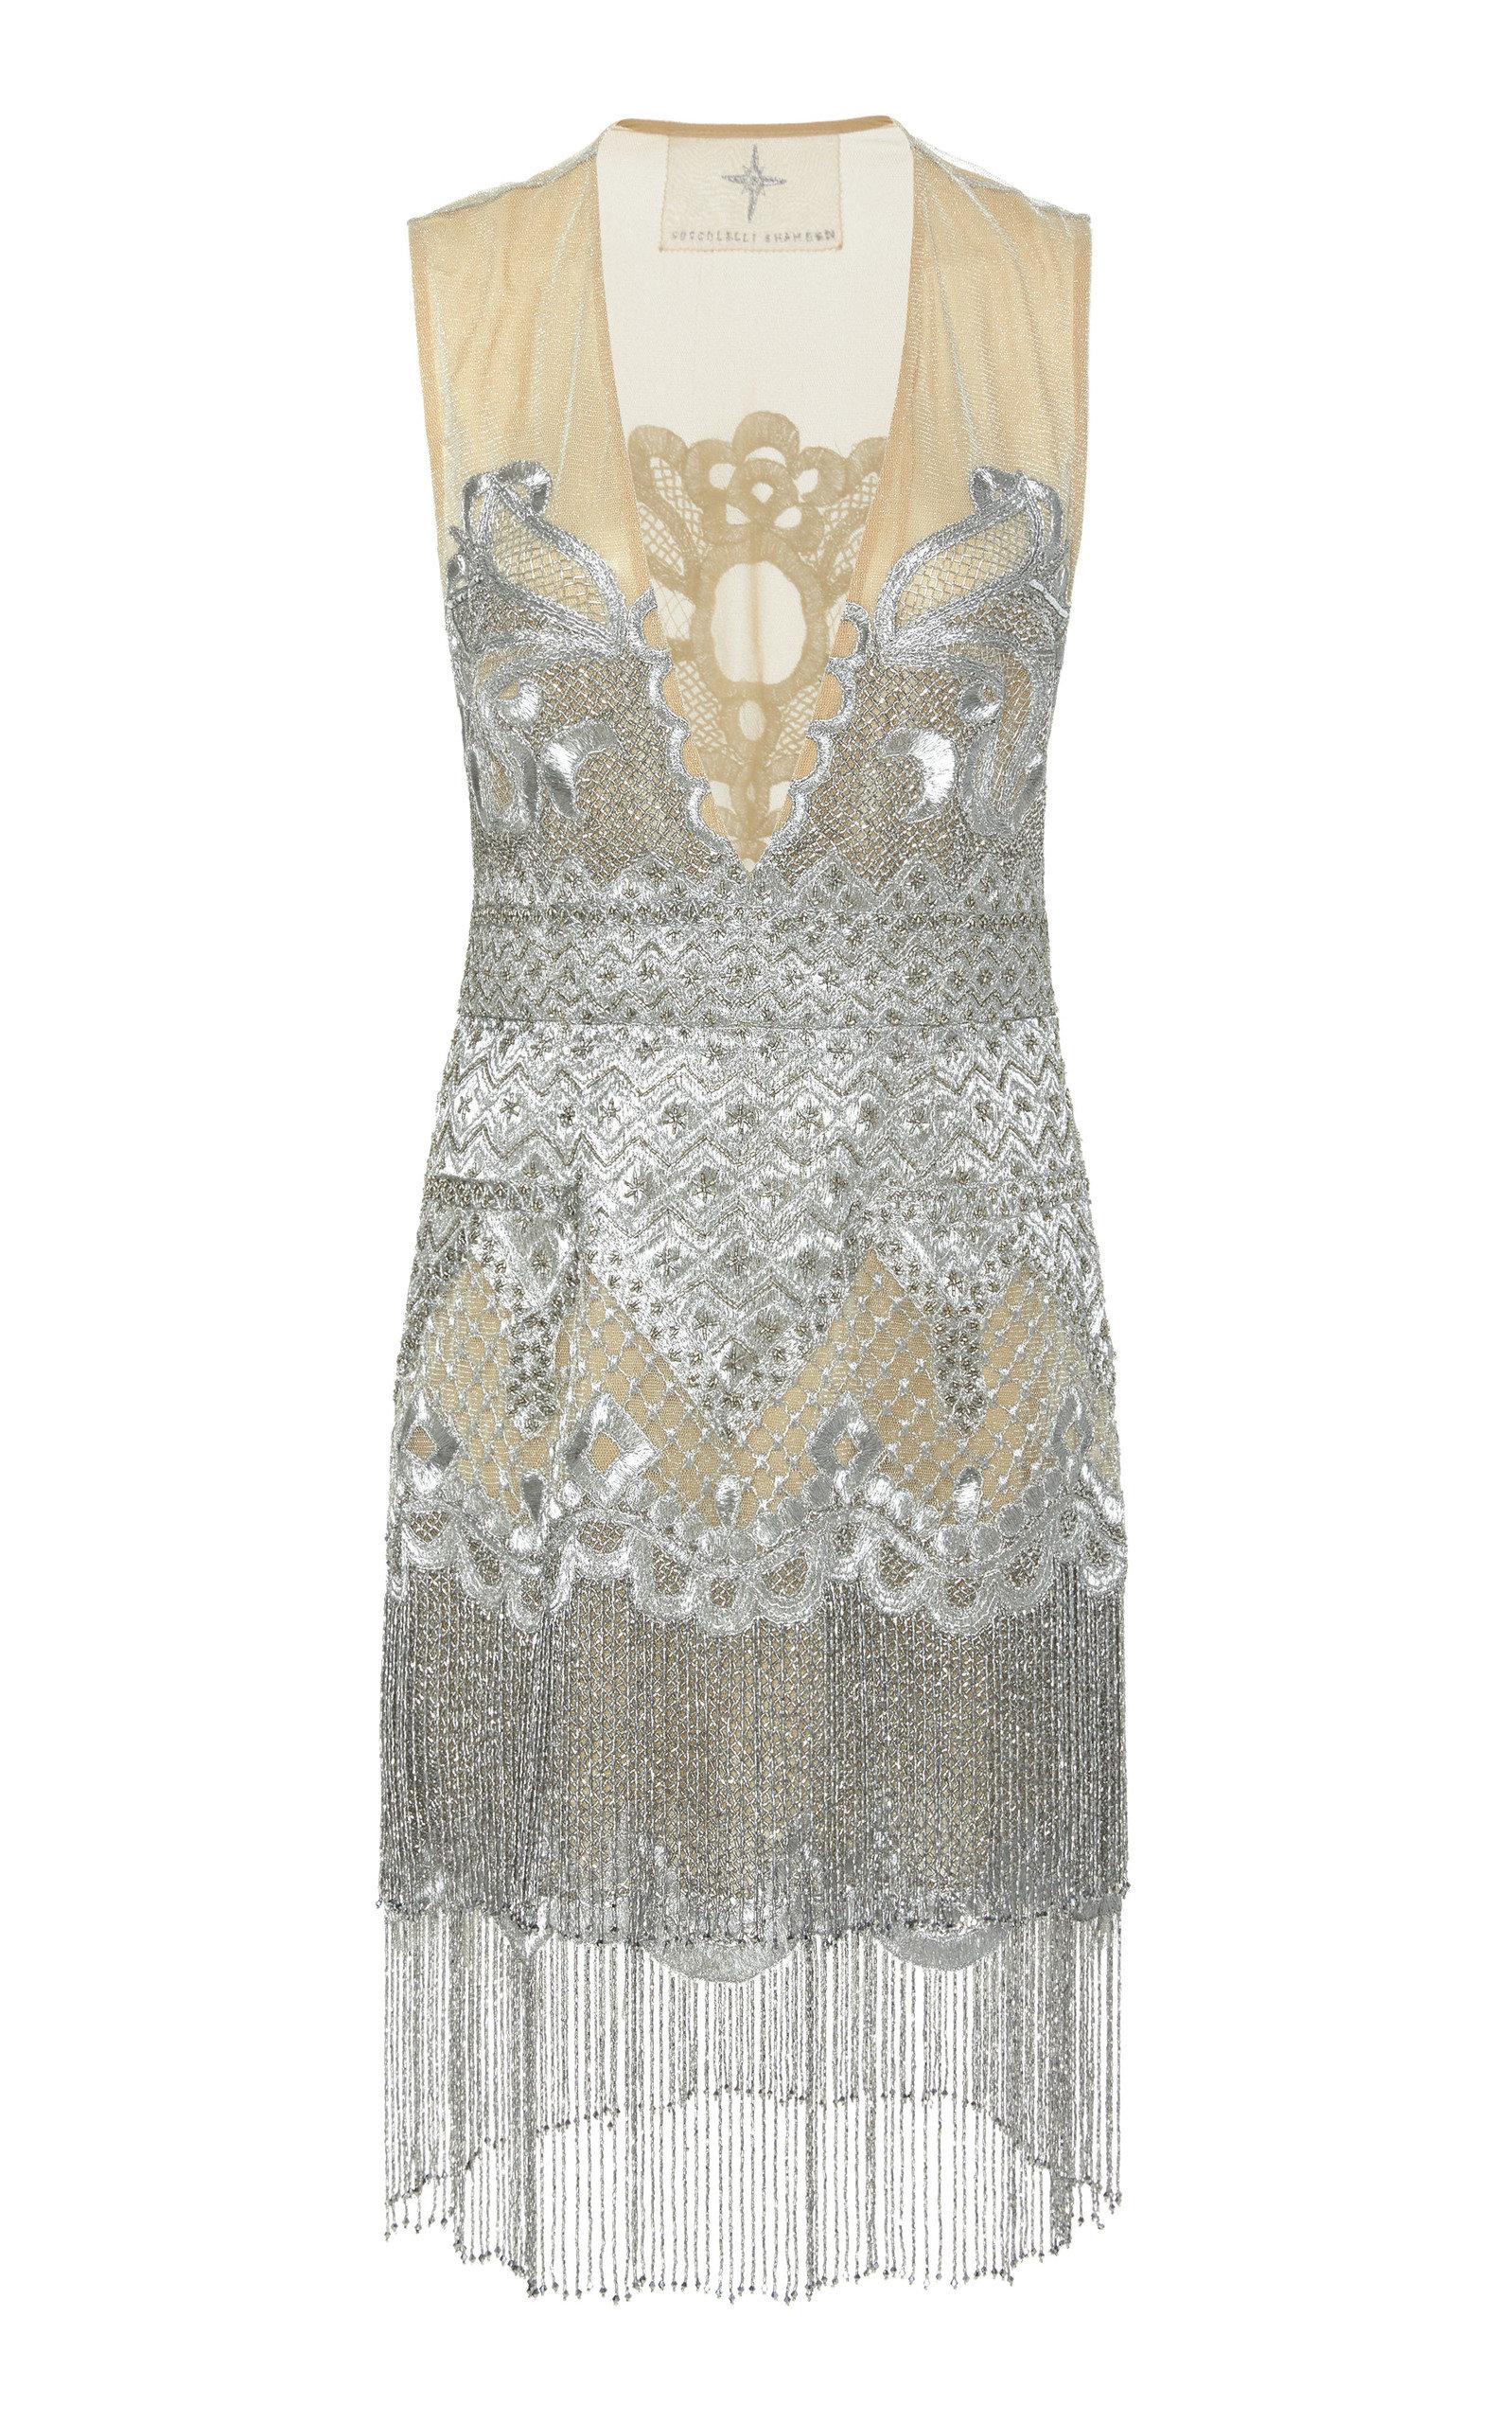 CUCCULELLI SHAHEEN Dreamweaver Silk Mini Dress in Silver